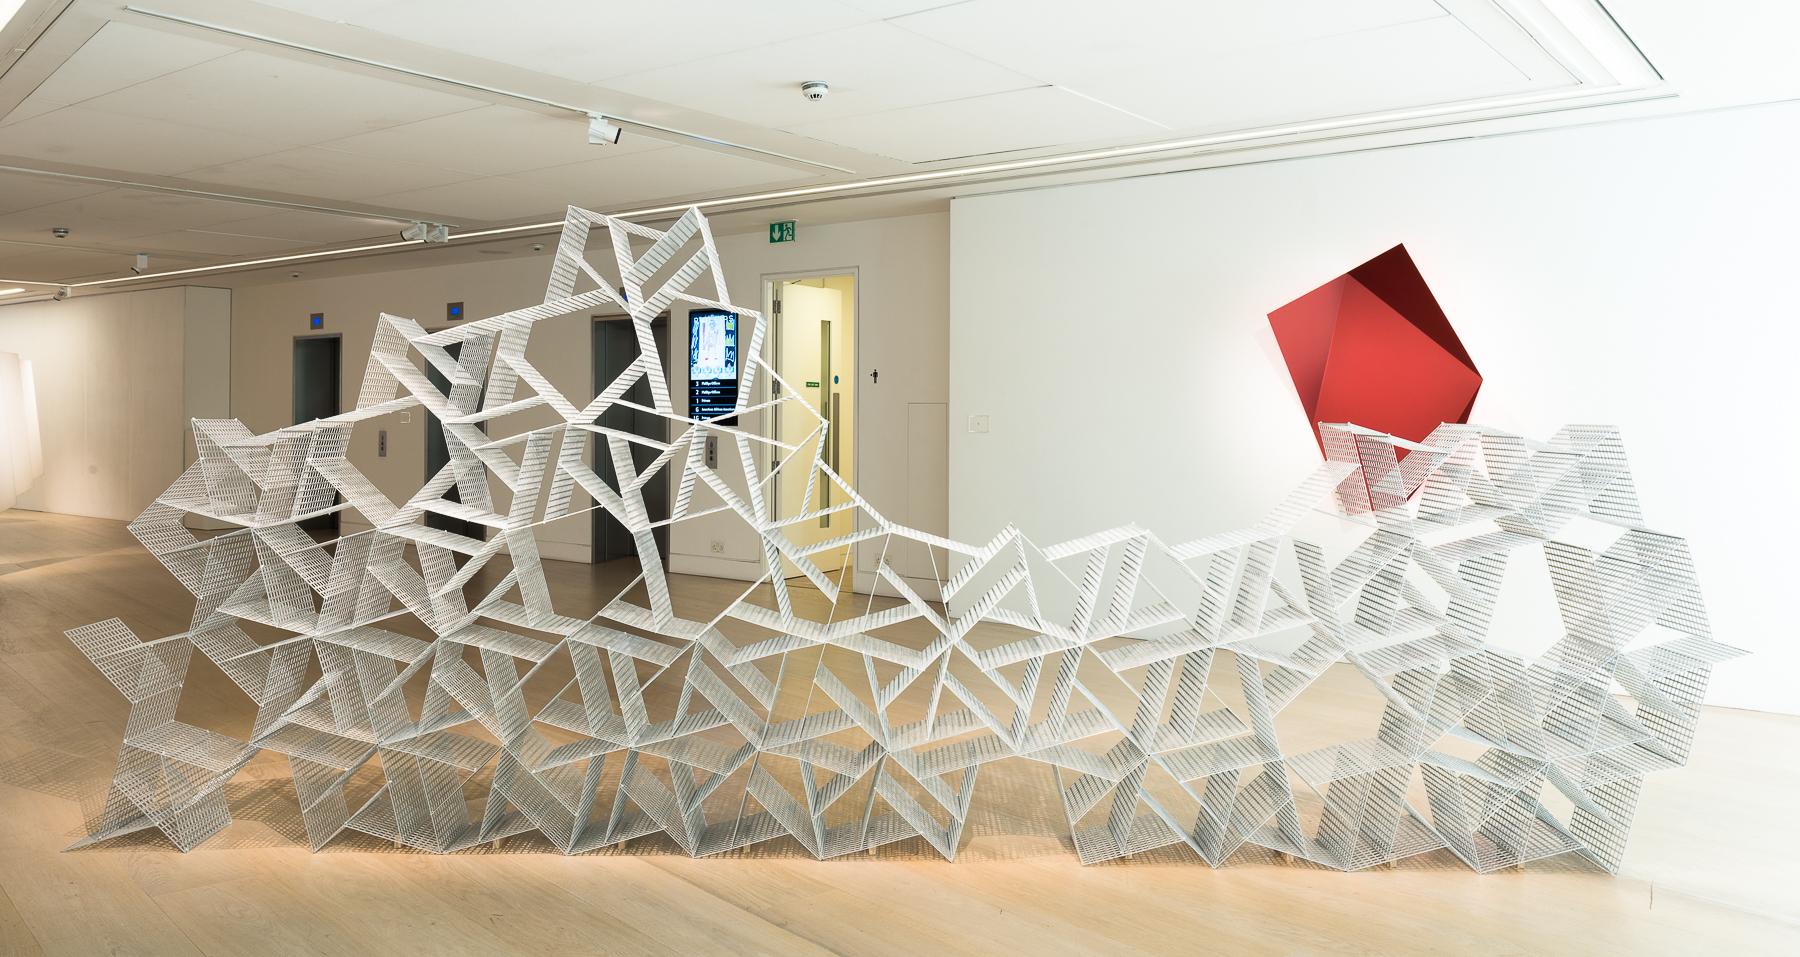 Exhibition at Phillips, 30 Berkeley Square, London, W1J 6JX, 15 – 22 Nov. 2017